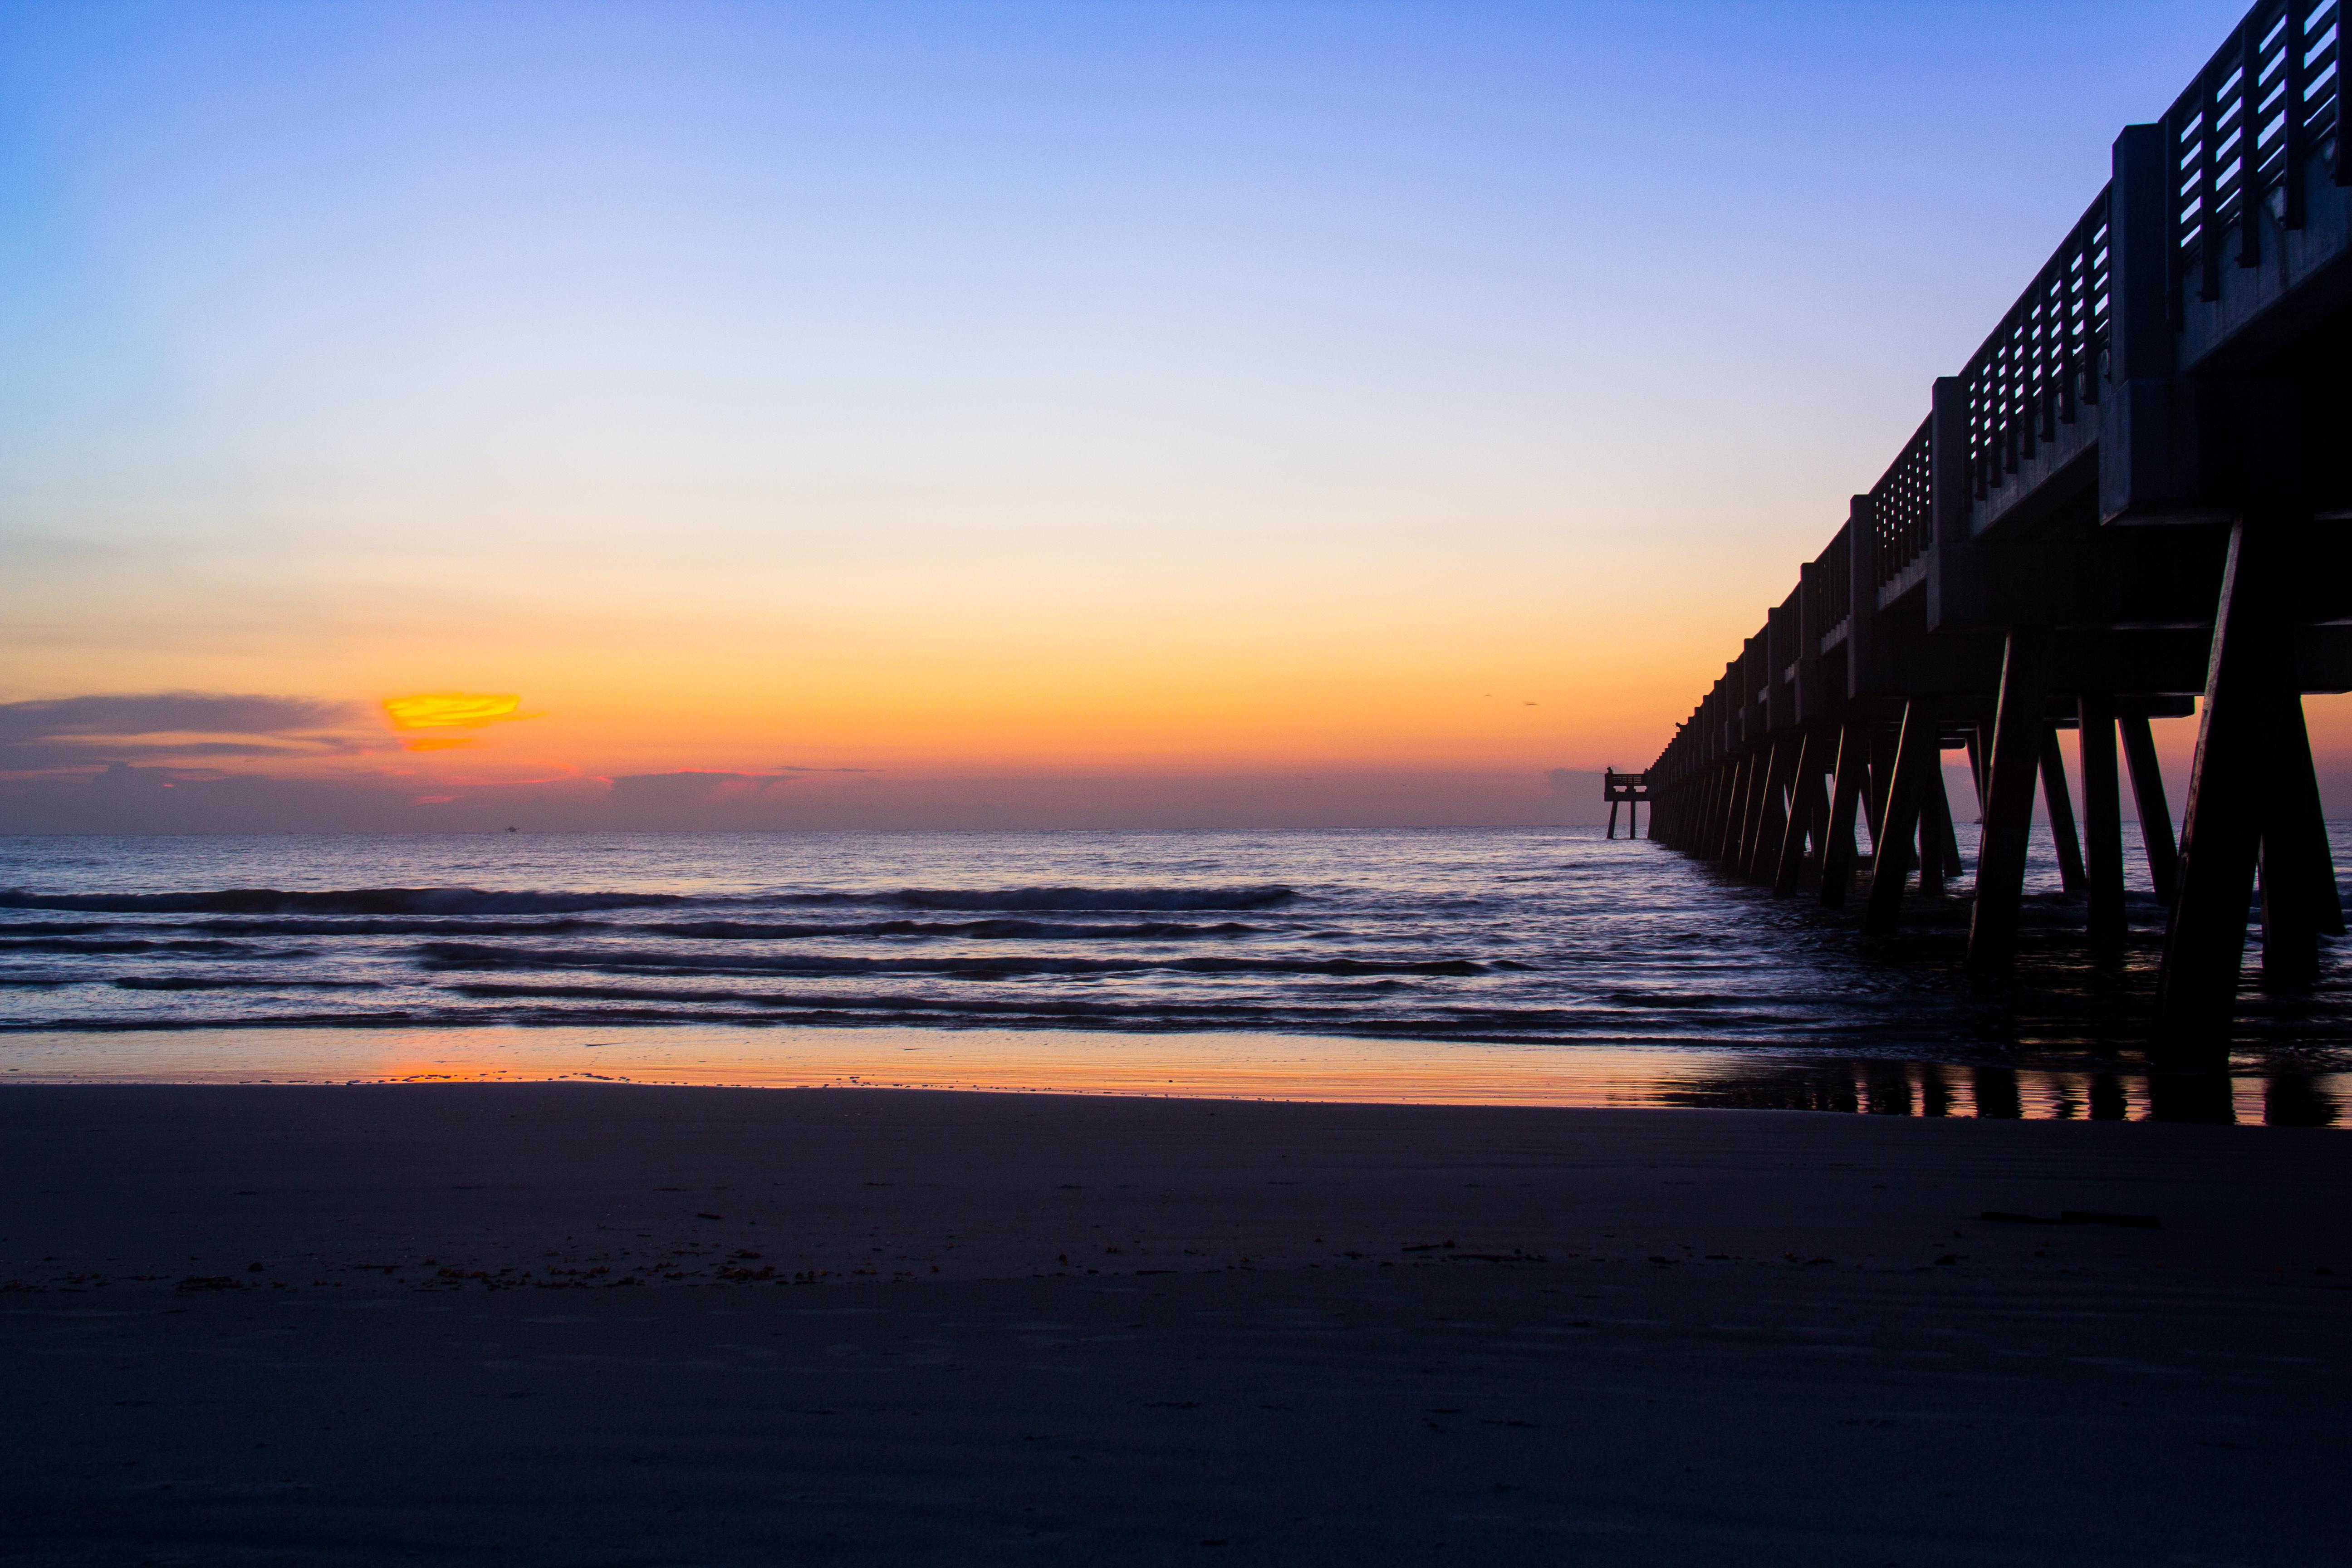 ponte vedra beach Ponte vedra beach tourism: tripadvisor has 12,053 reviews of ponte vedra beach hotels, attractions, and restaurants making it your best ponte vedra beach resource.